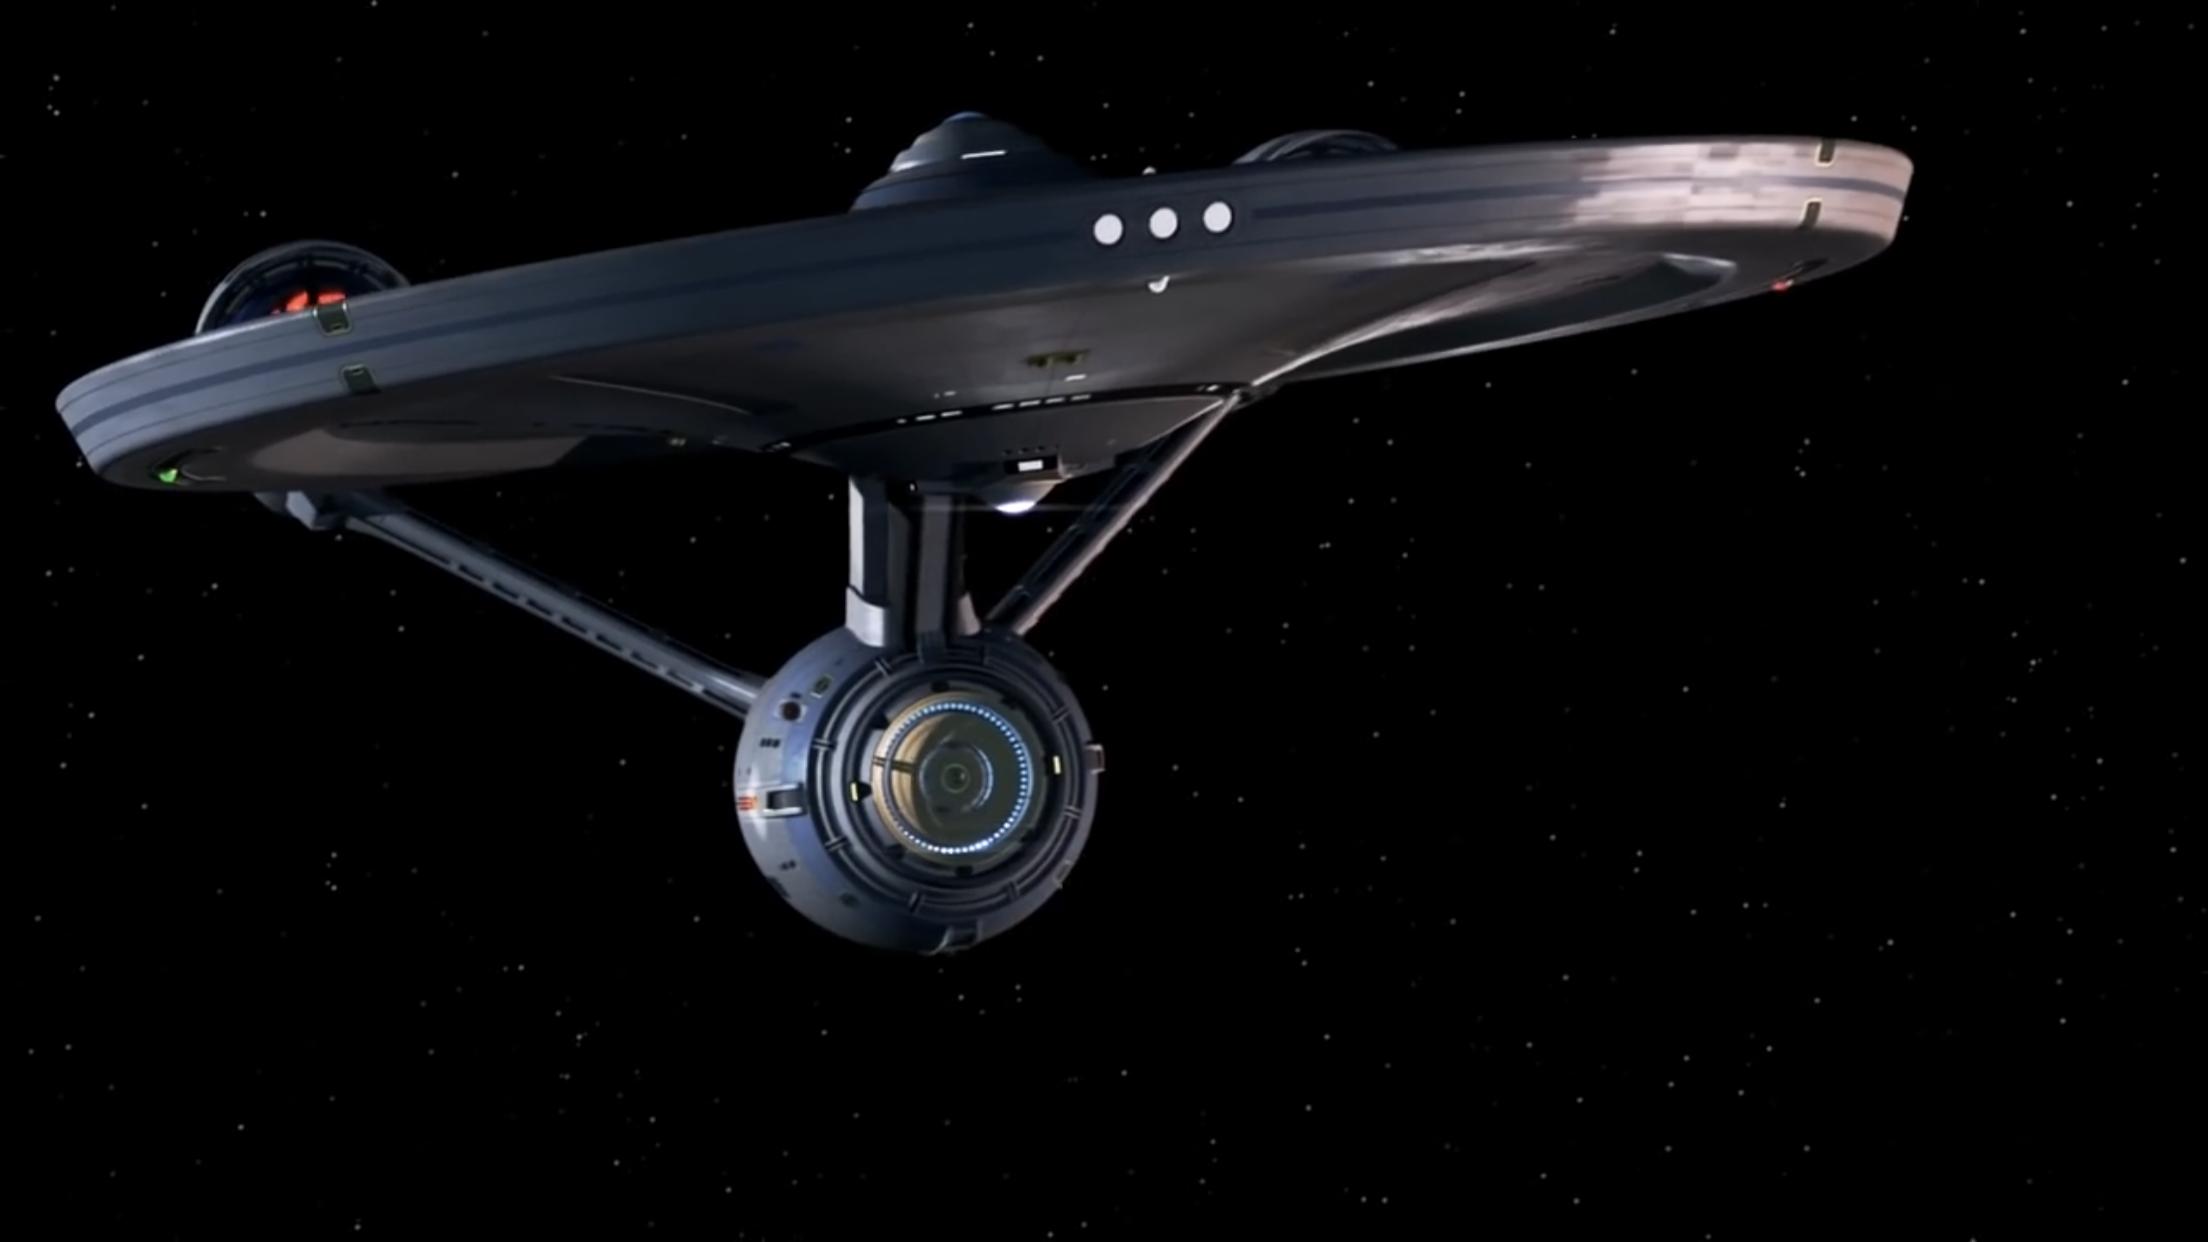 U S S Enterprise A Far Better Redesign Of The Classic Than Anything J J Or Discovery Ever Did Or Ever Will Do Star Trek Star Trek Starships Star Trek Ships